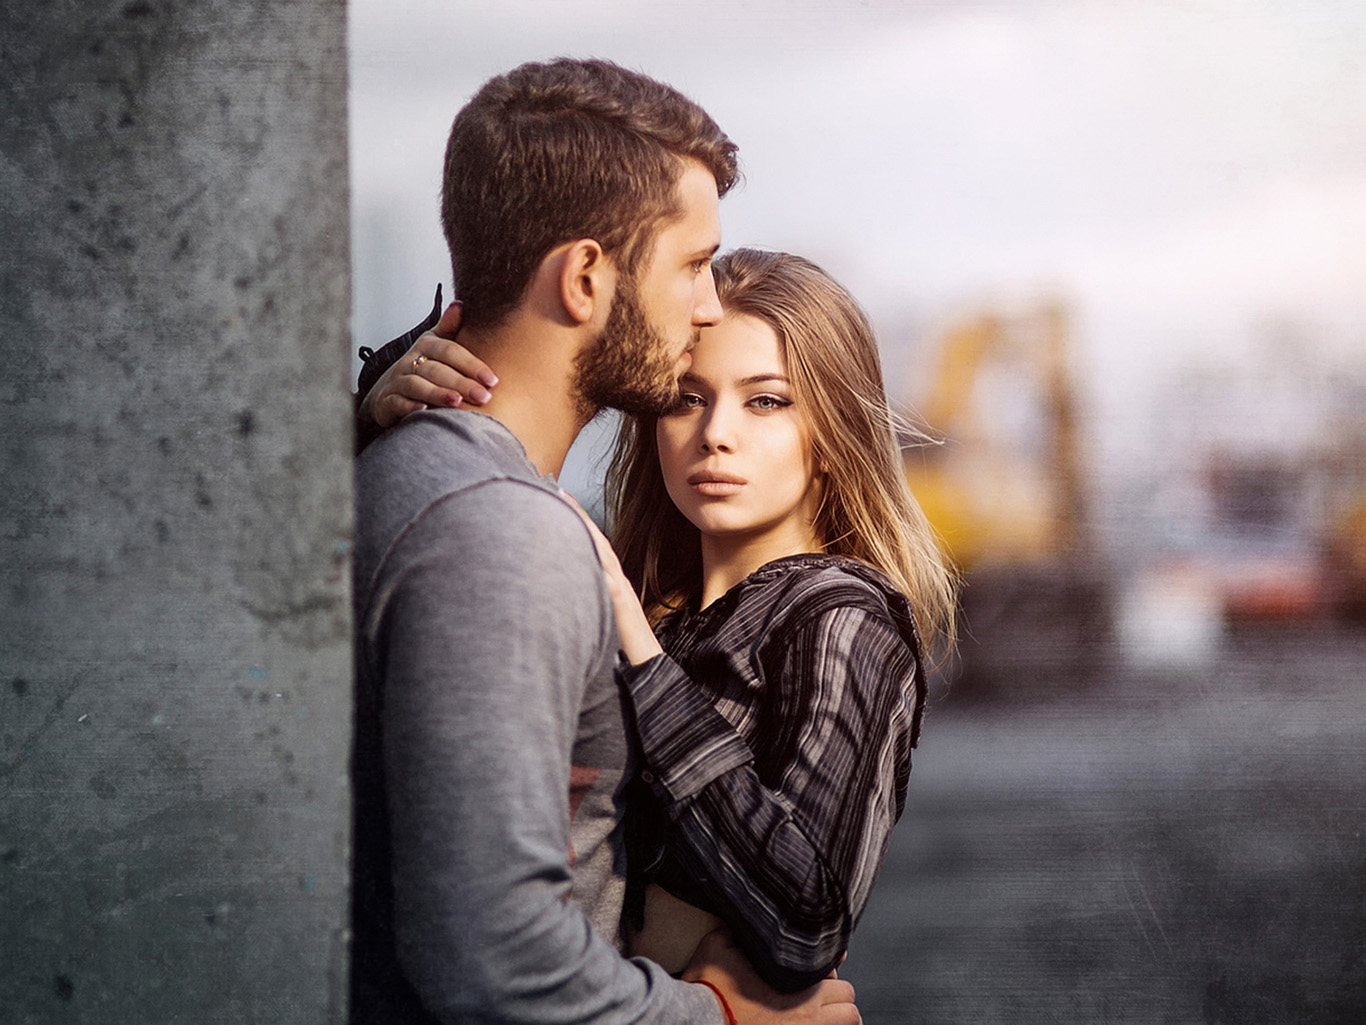 Берени женшна секс